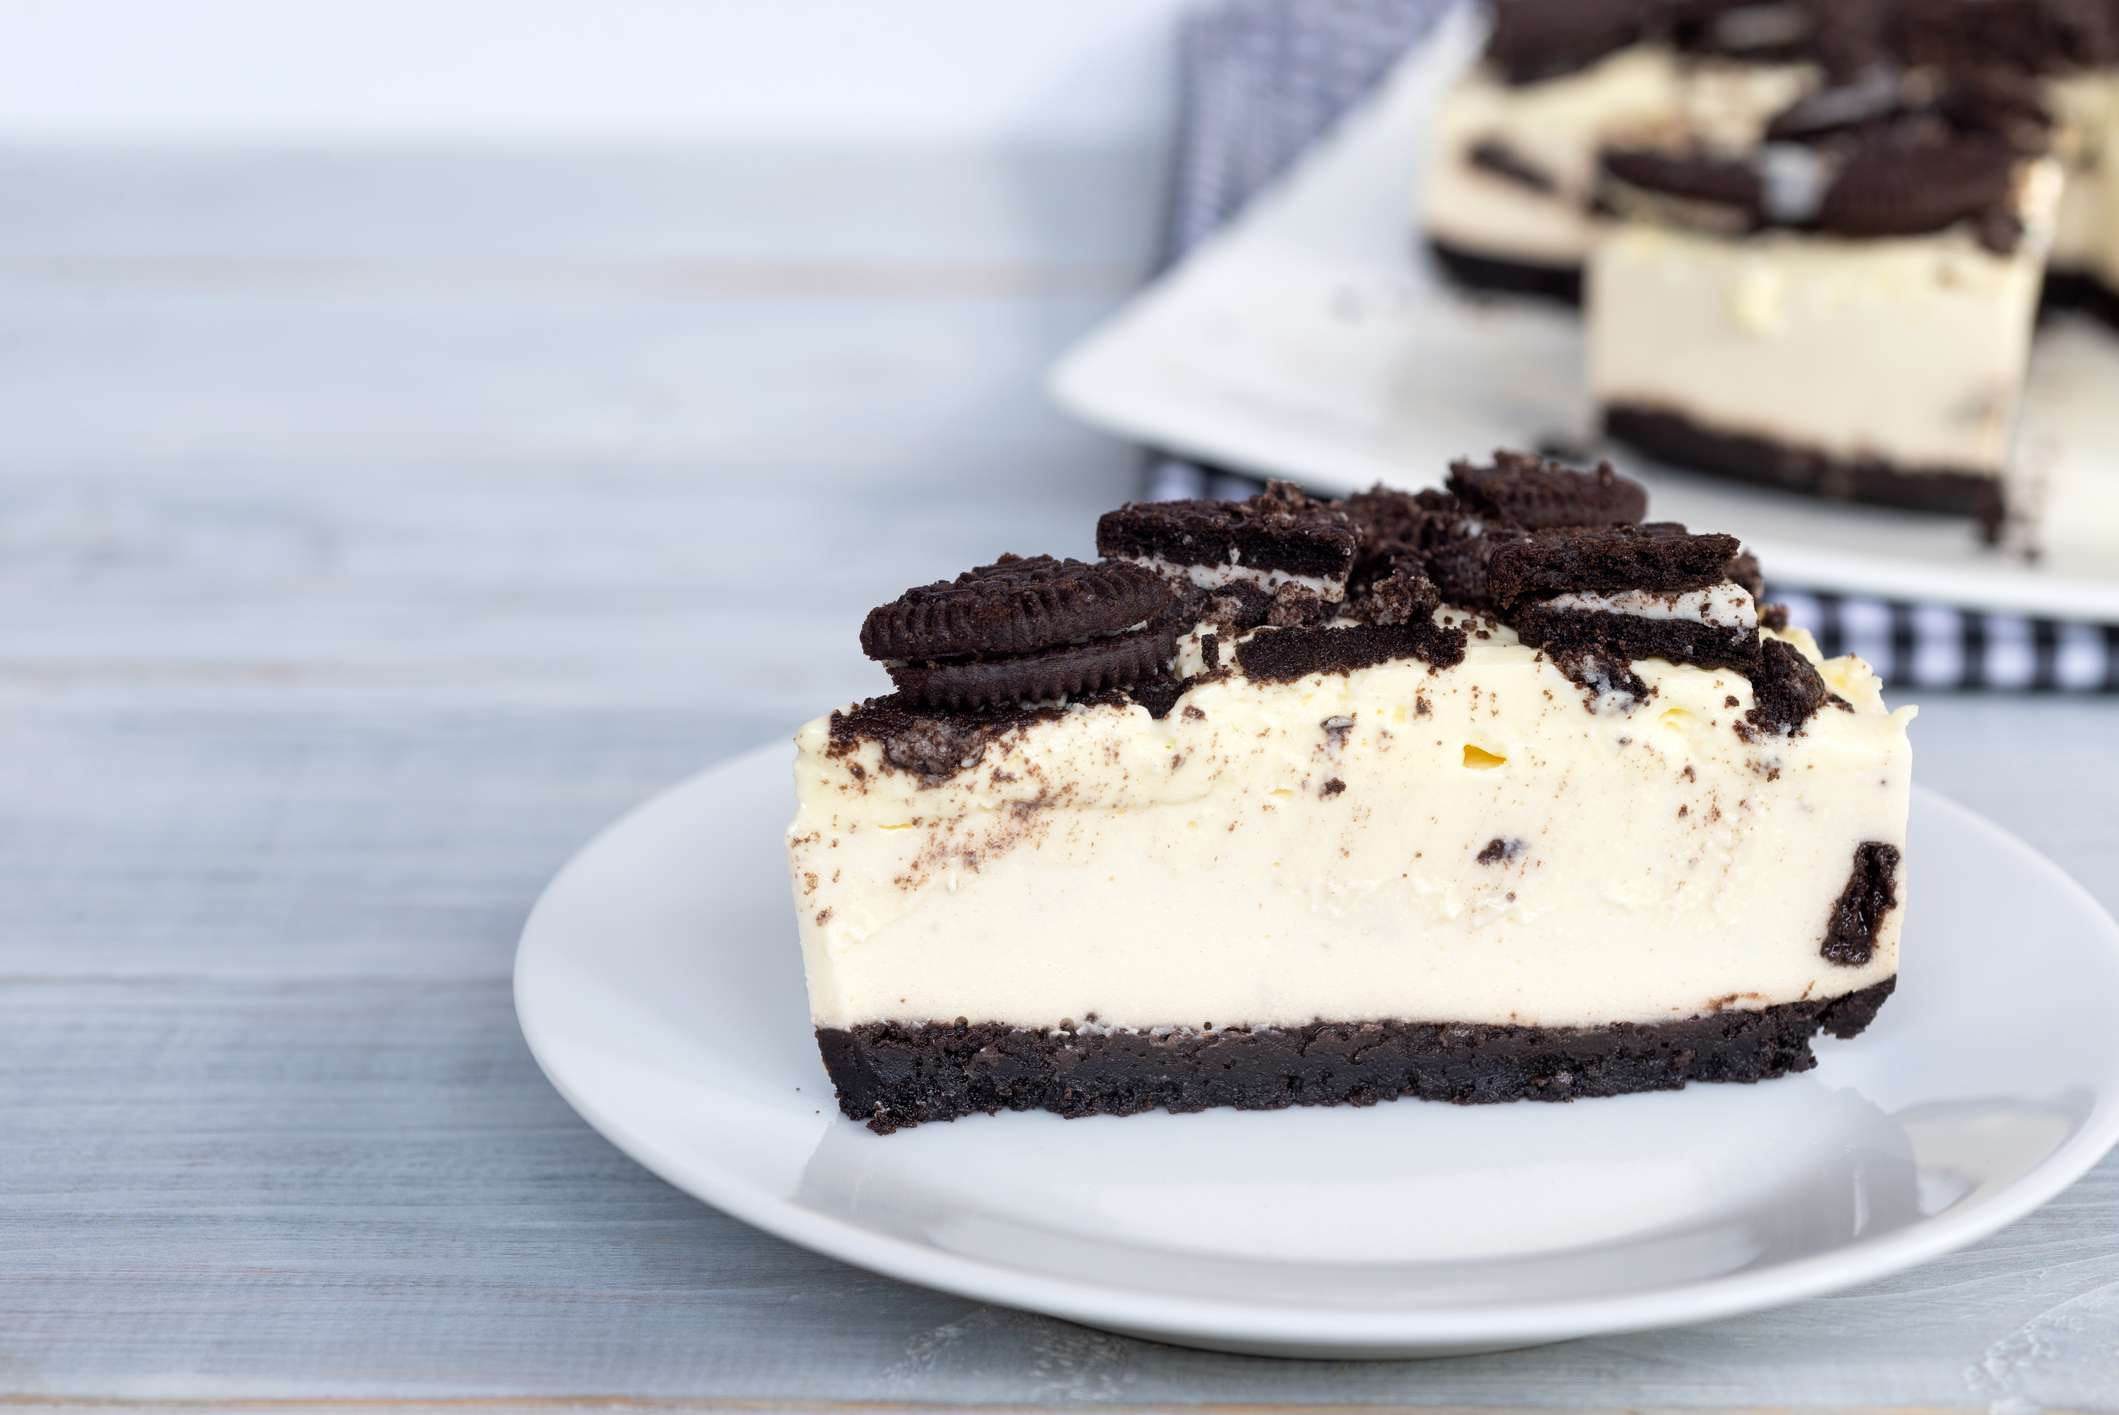 Chocolate cream dessert